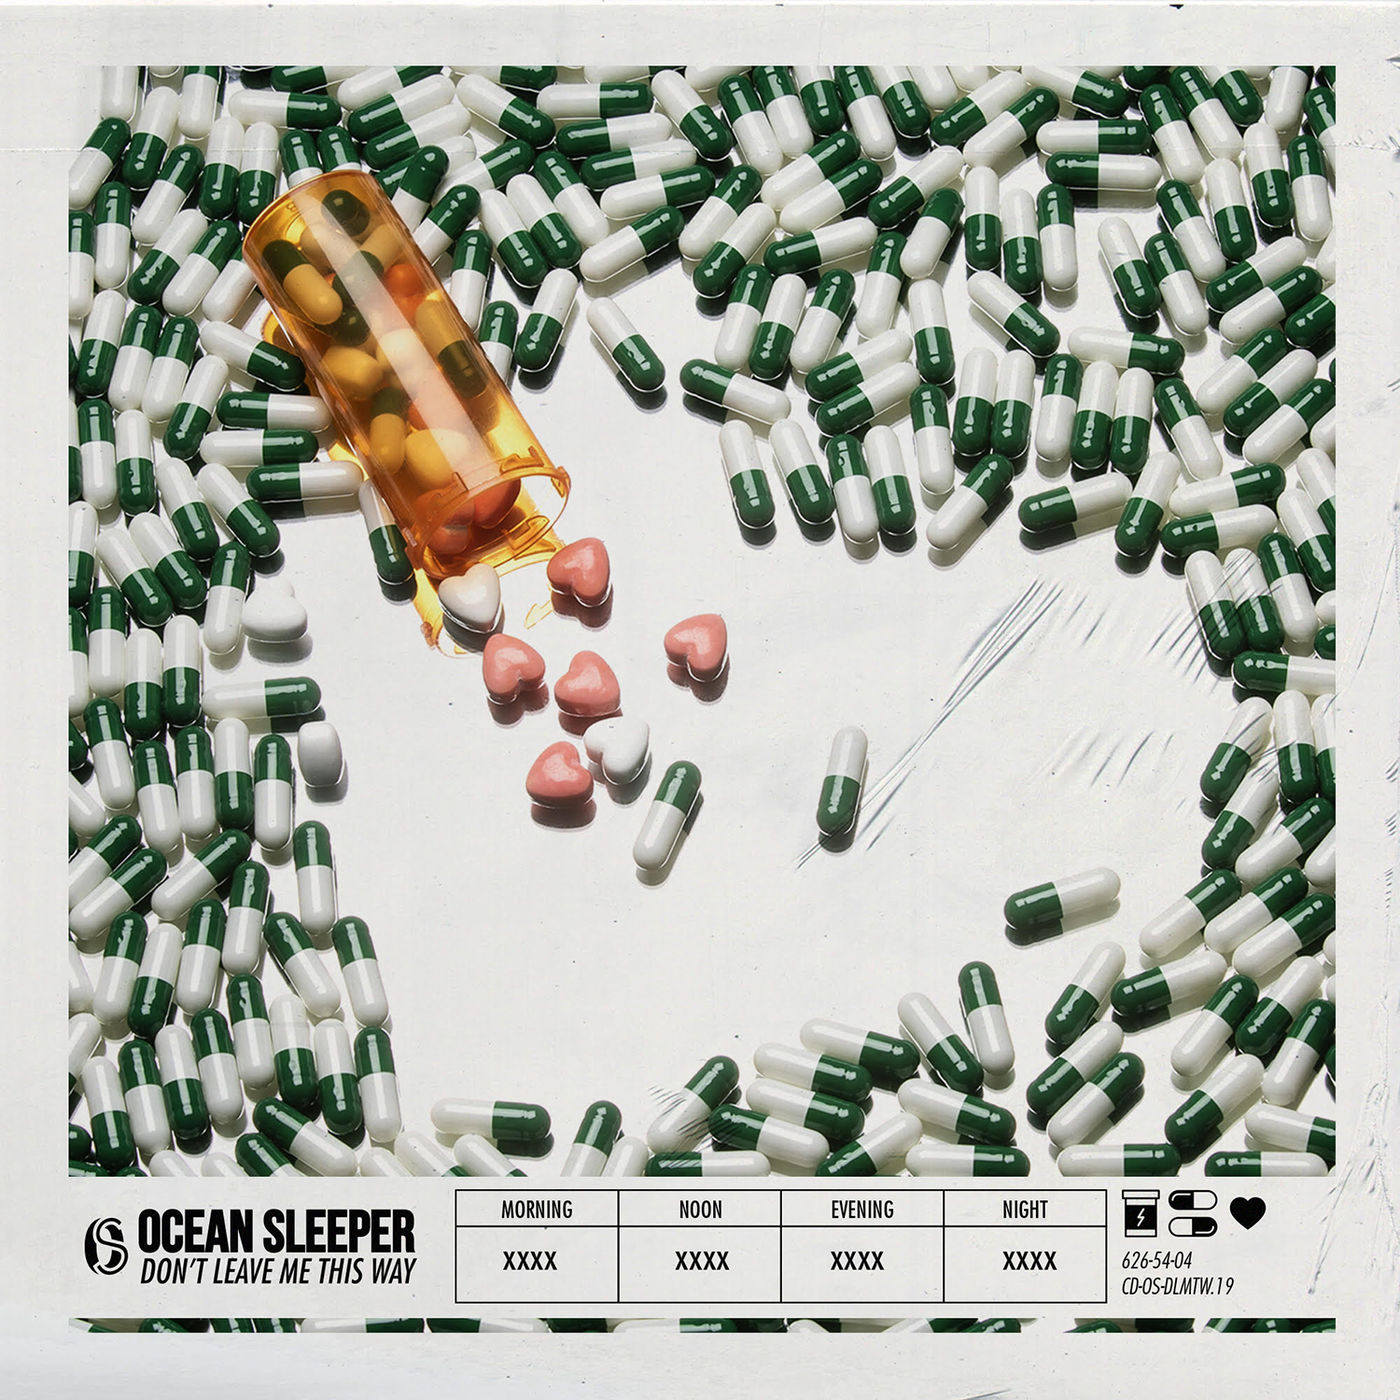 Ocean Sleeper - Killing Me [single] (2019)